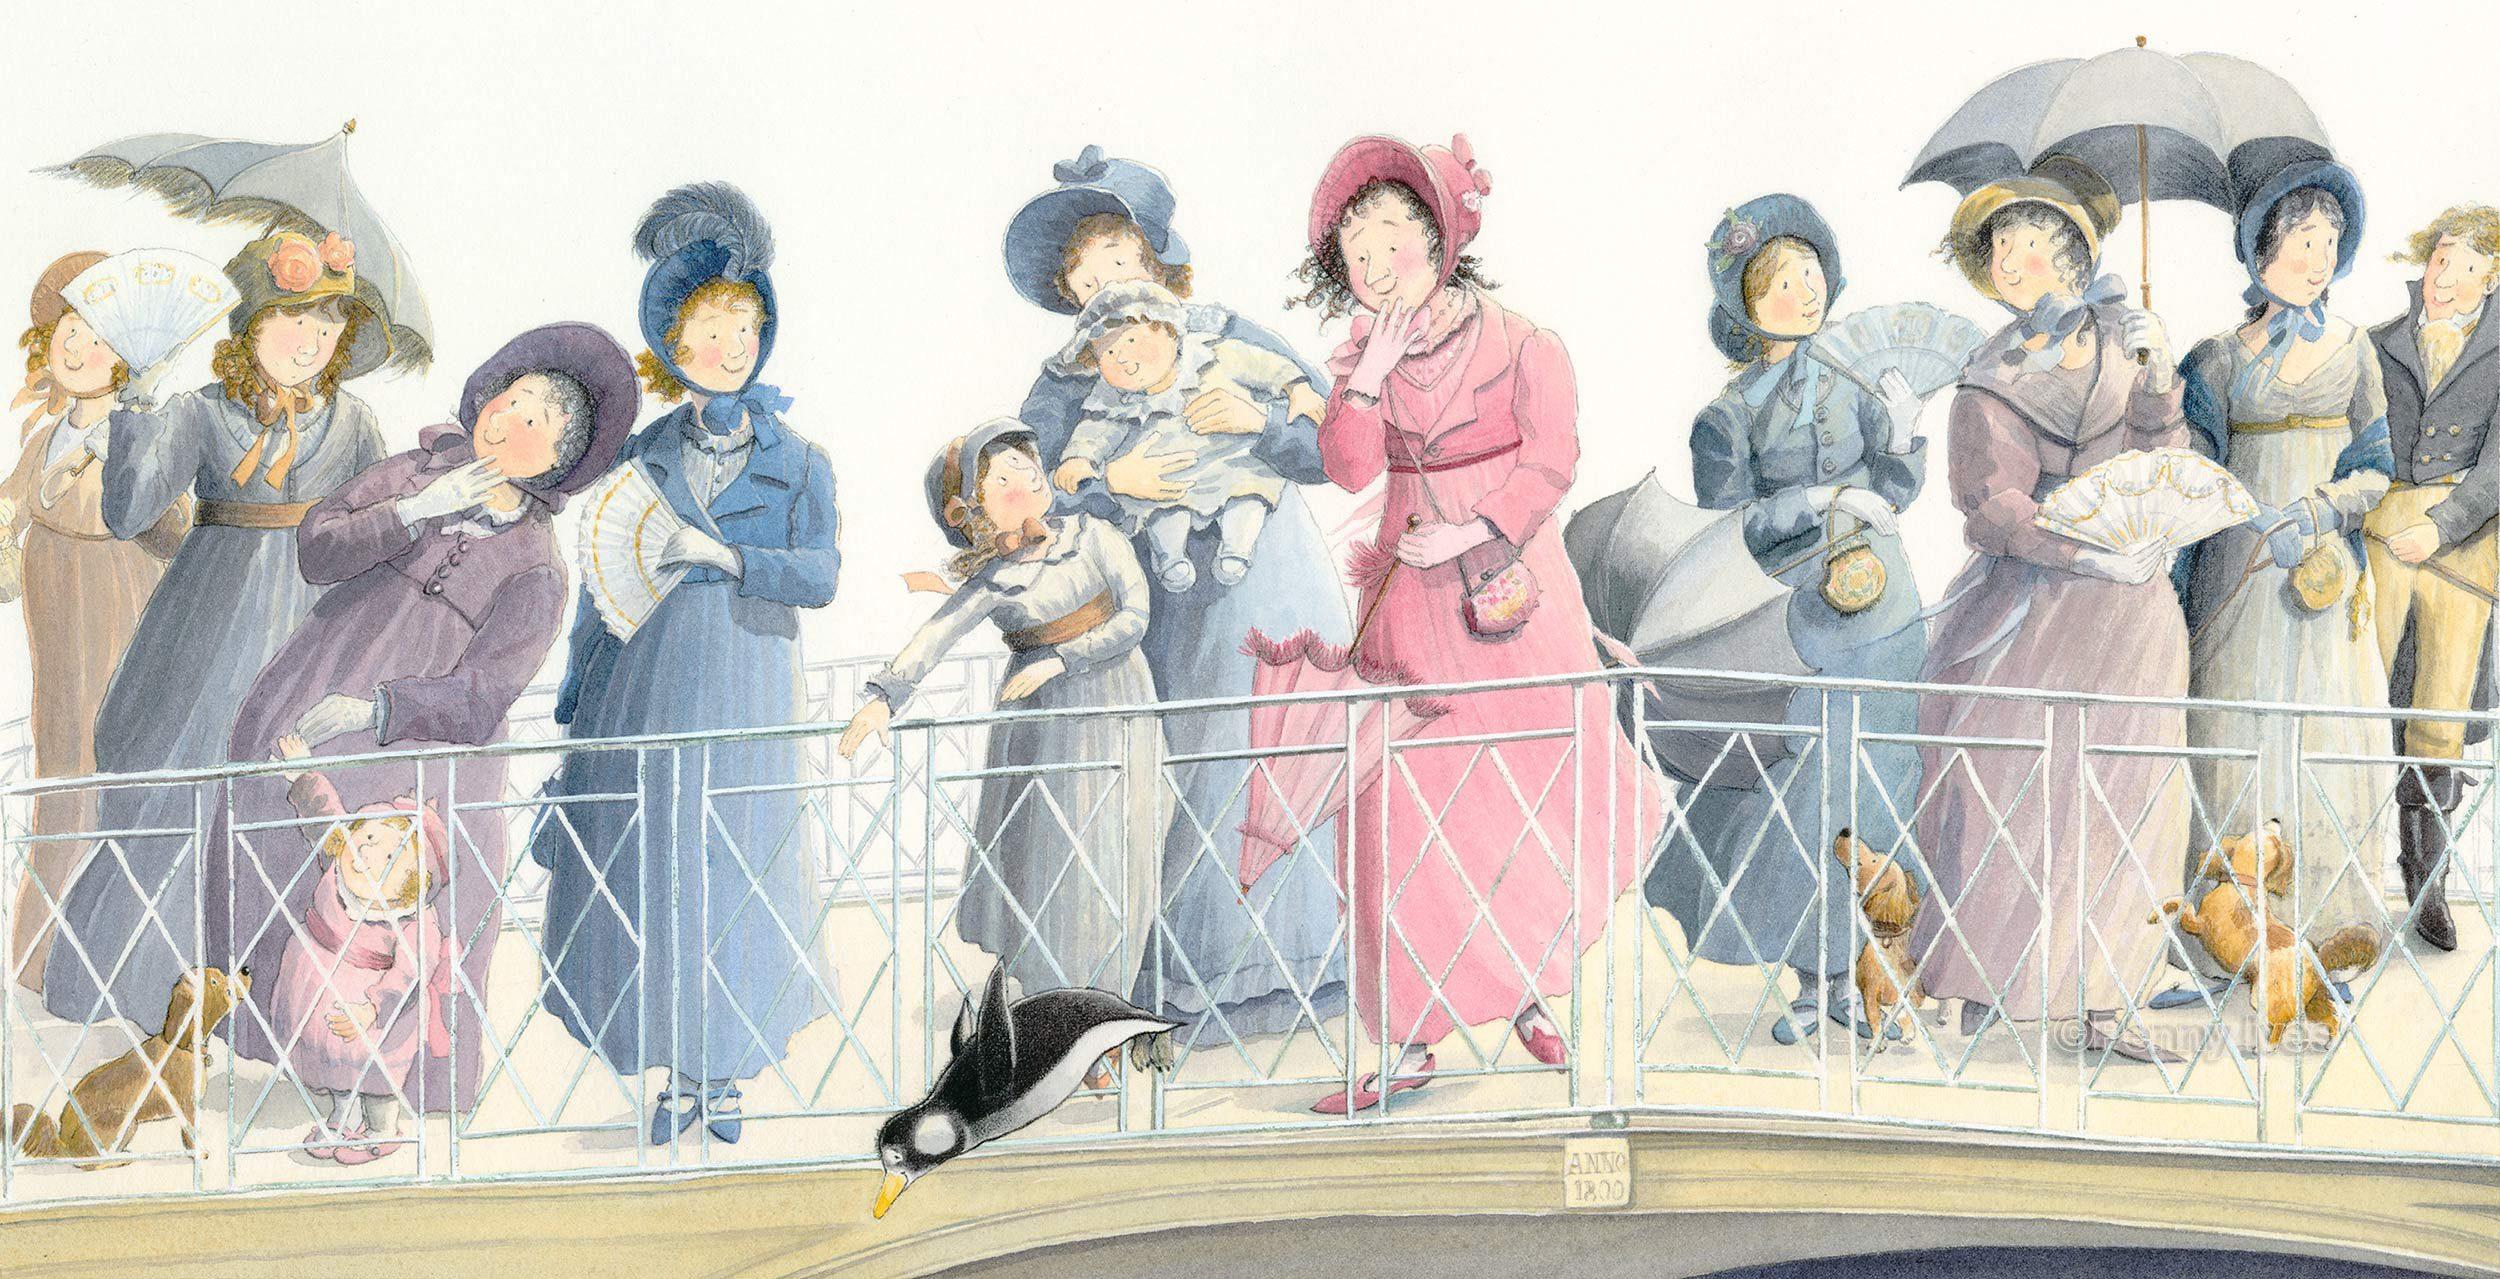 Jane Austen and the penguin